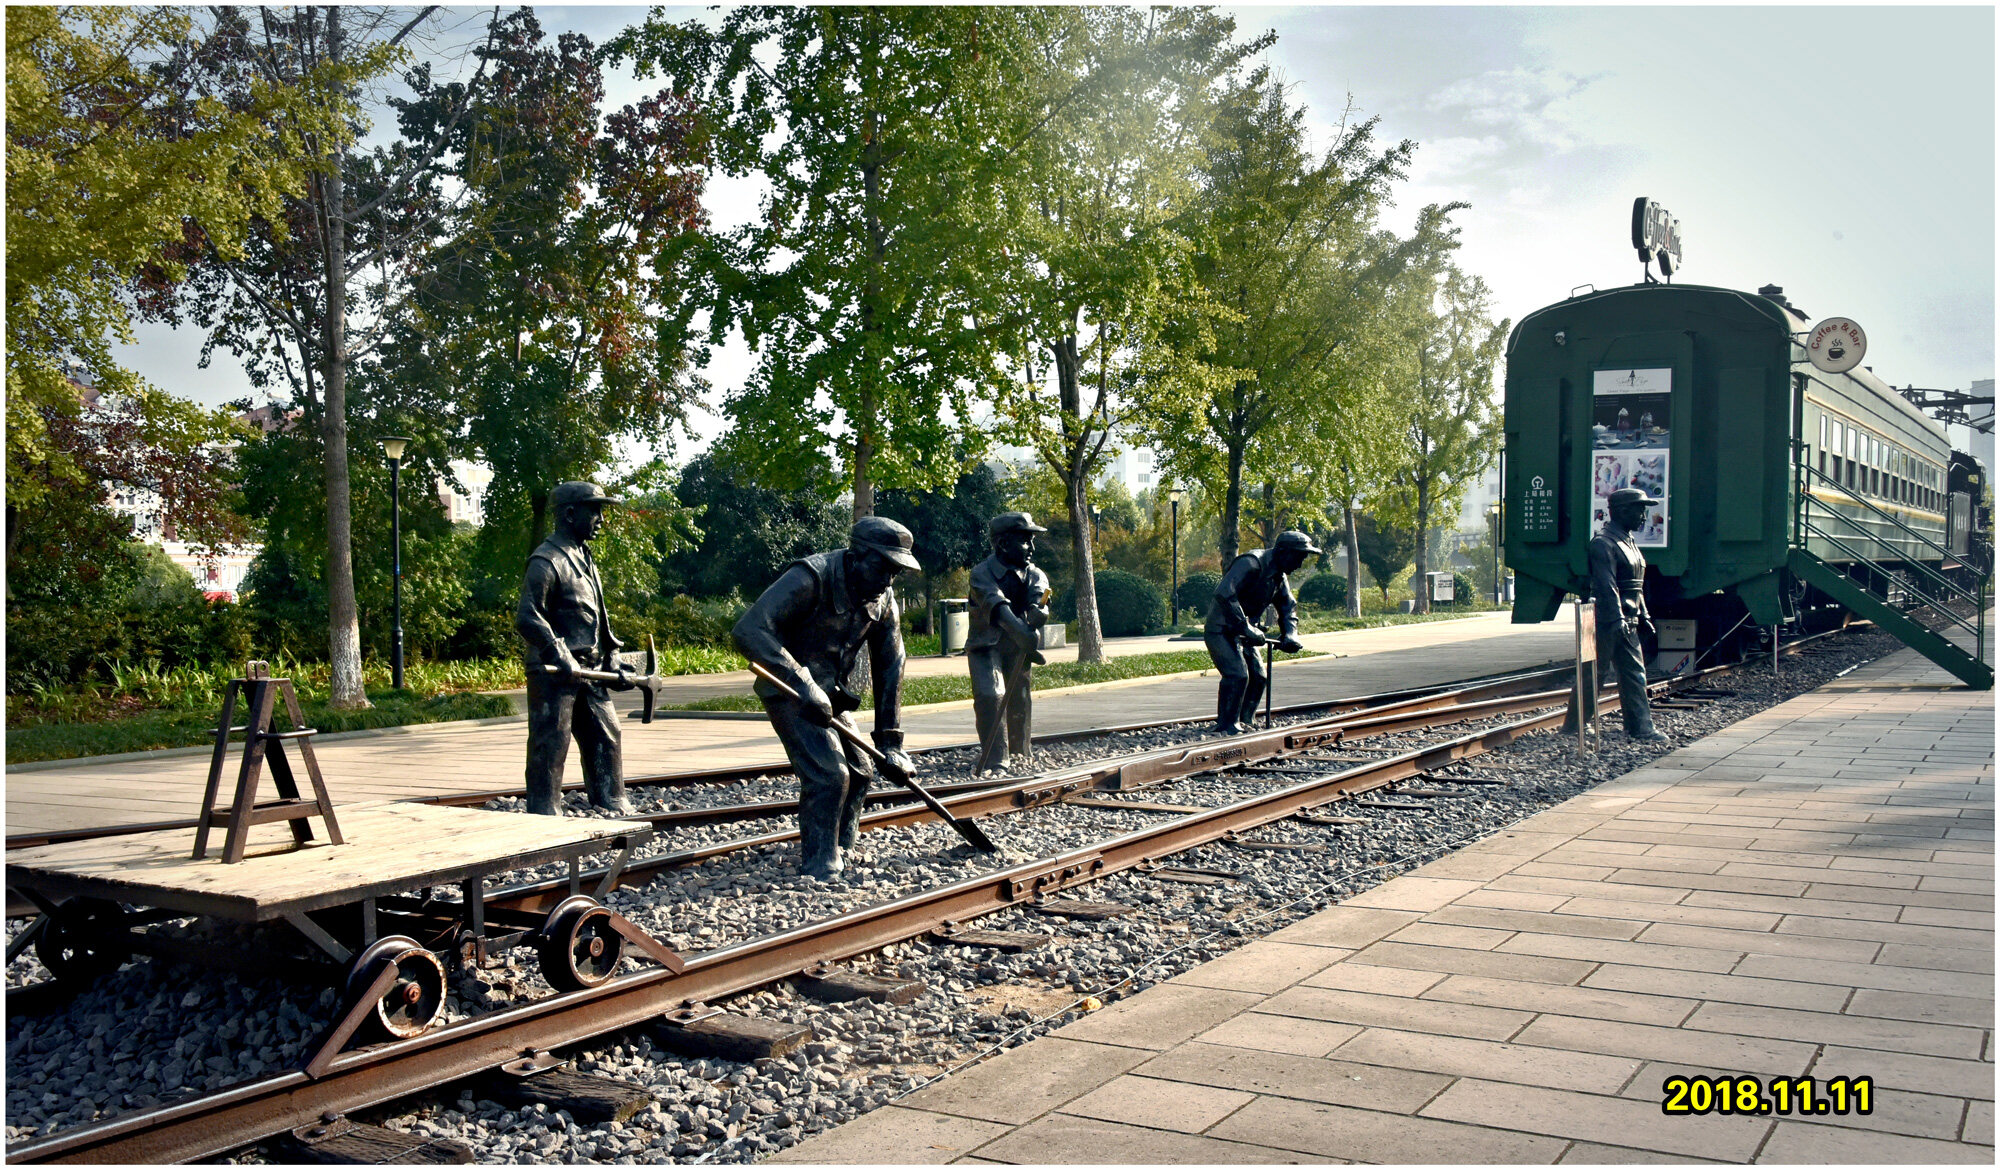 DSC_4257铁路工人雕塑 2.jpg